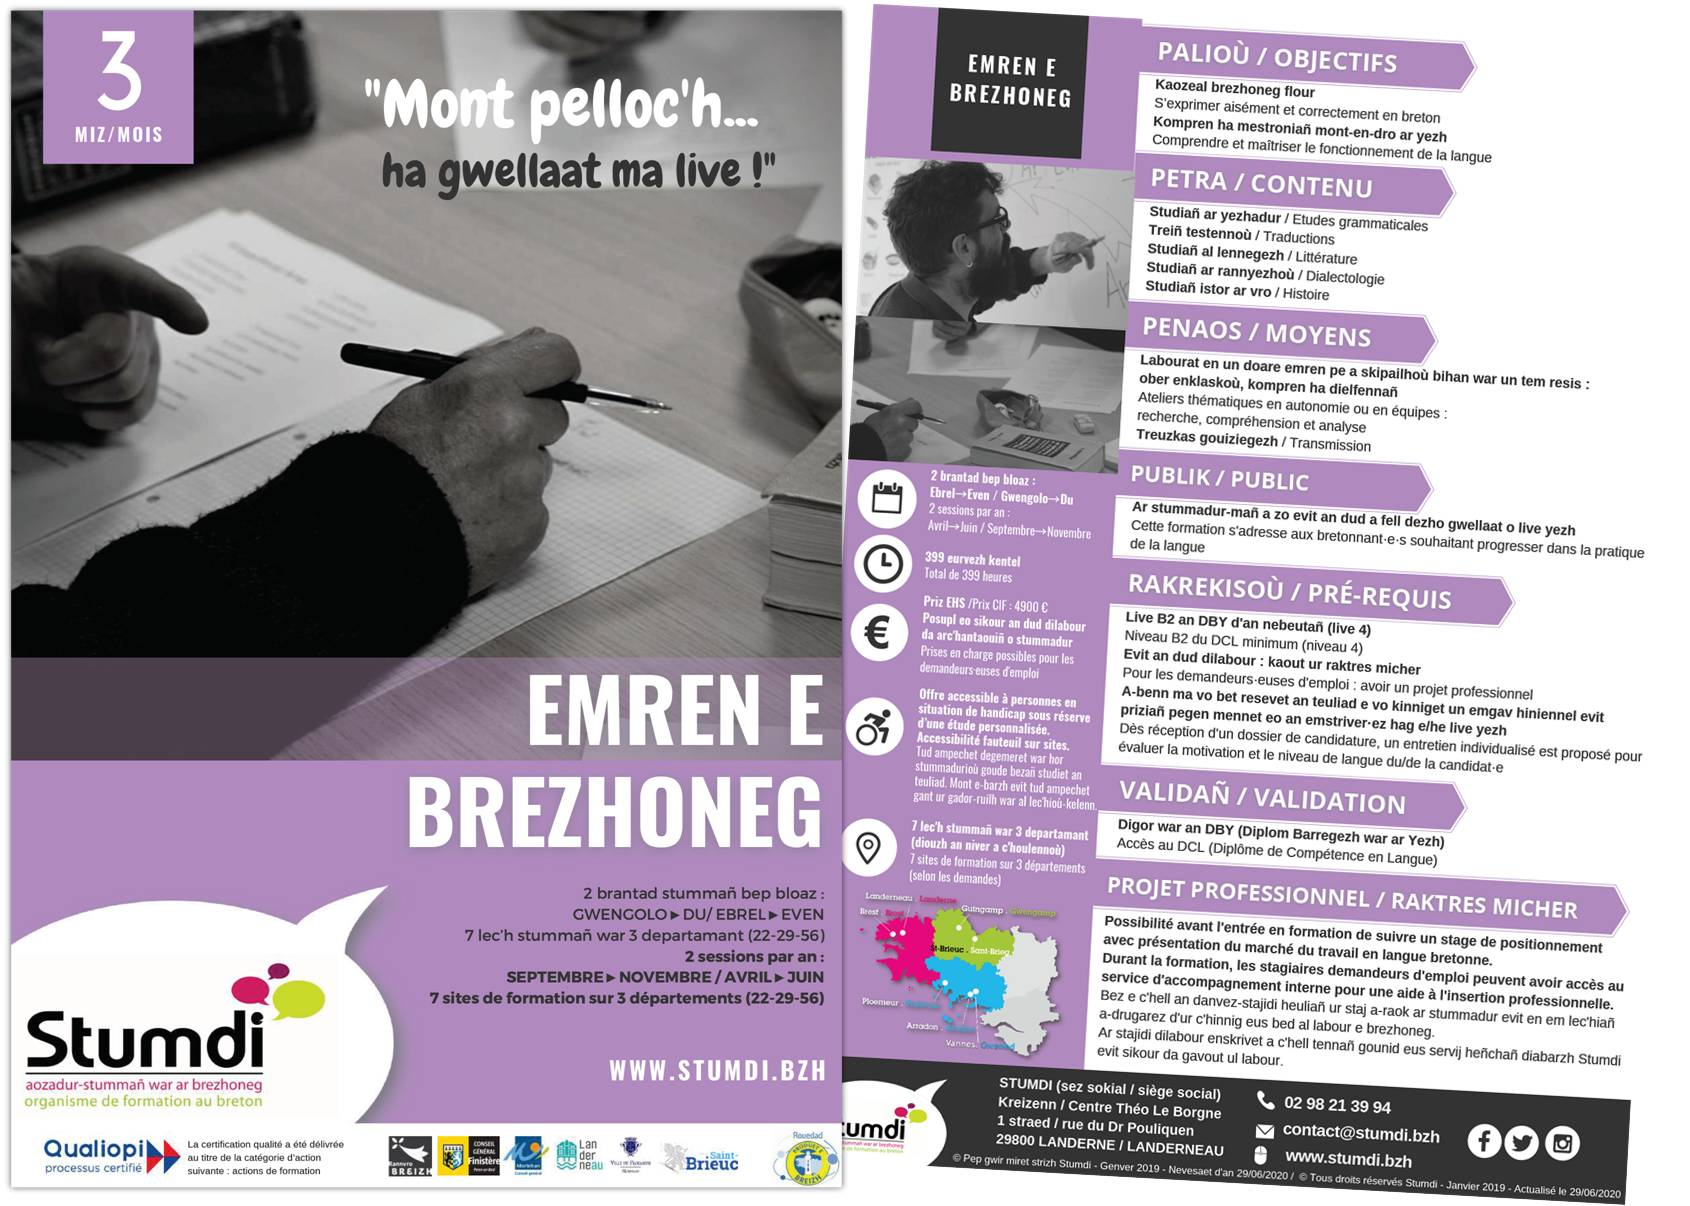 Emren e brezhoneg - Stumdi centre de formation en langue bretonne - Kreizenn stummañ war ar brezhoneg